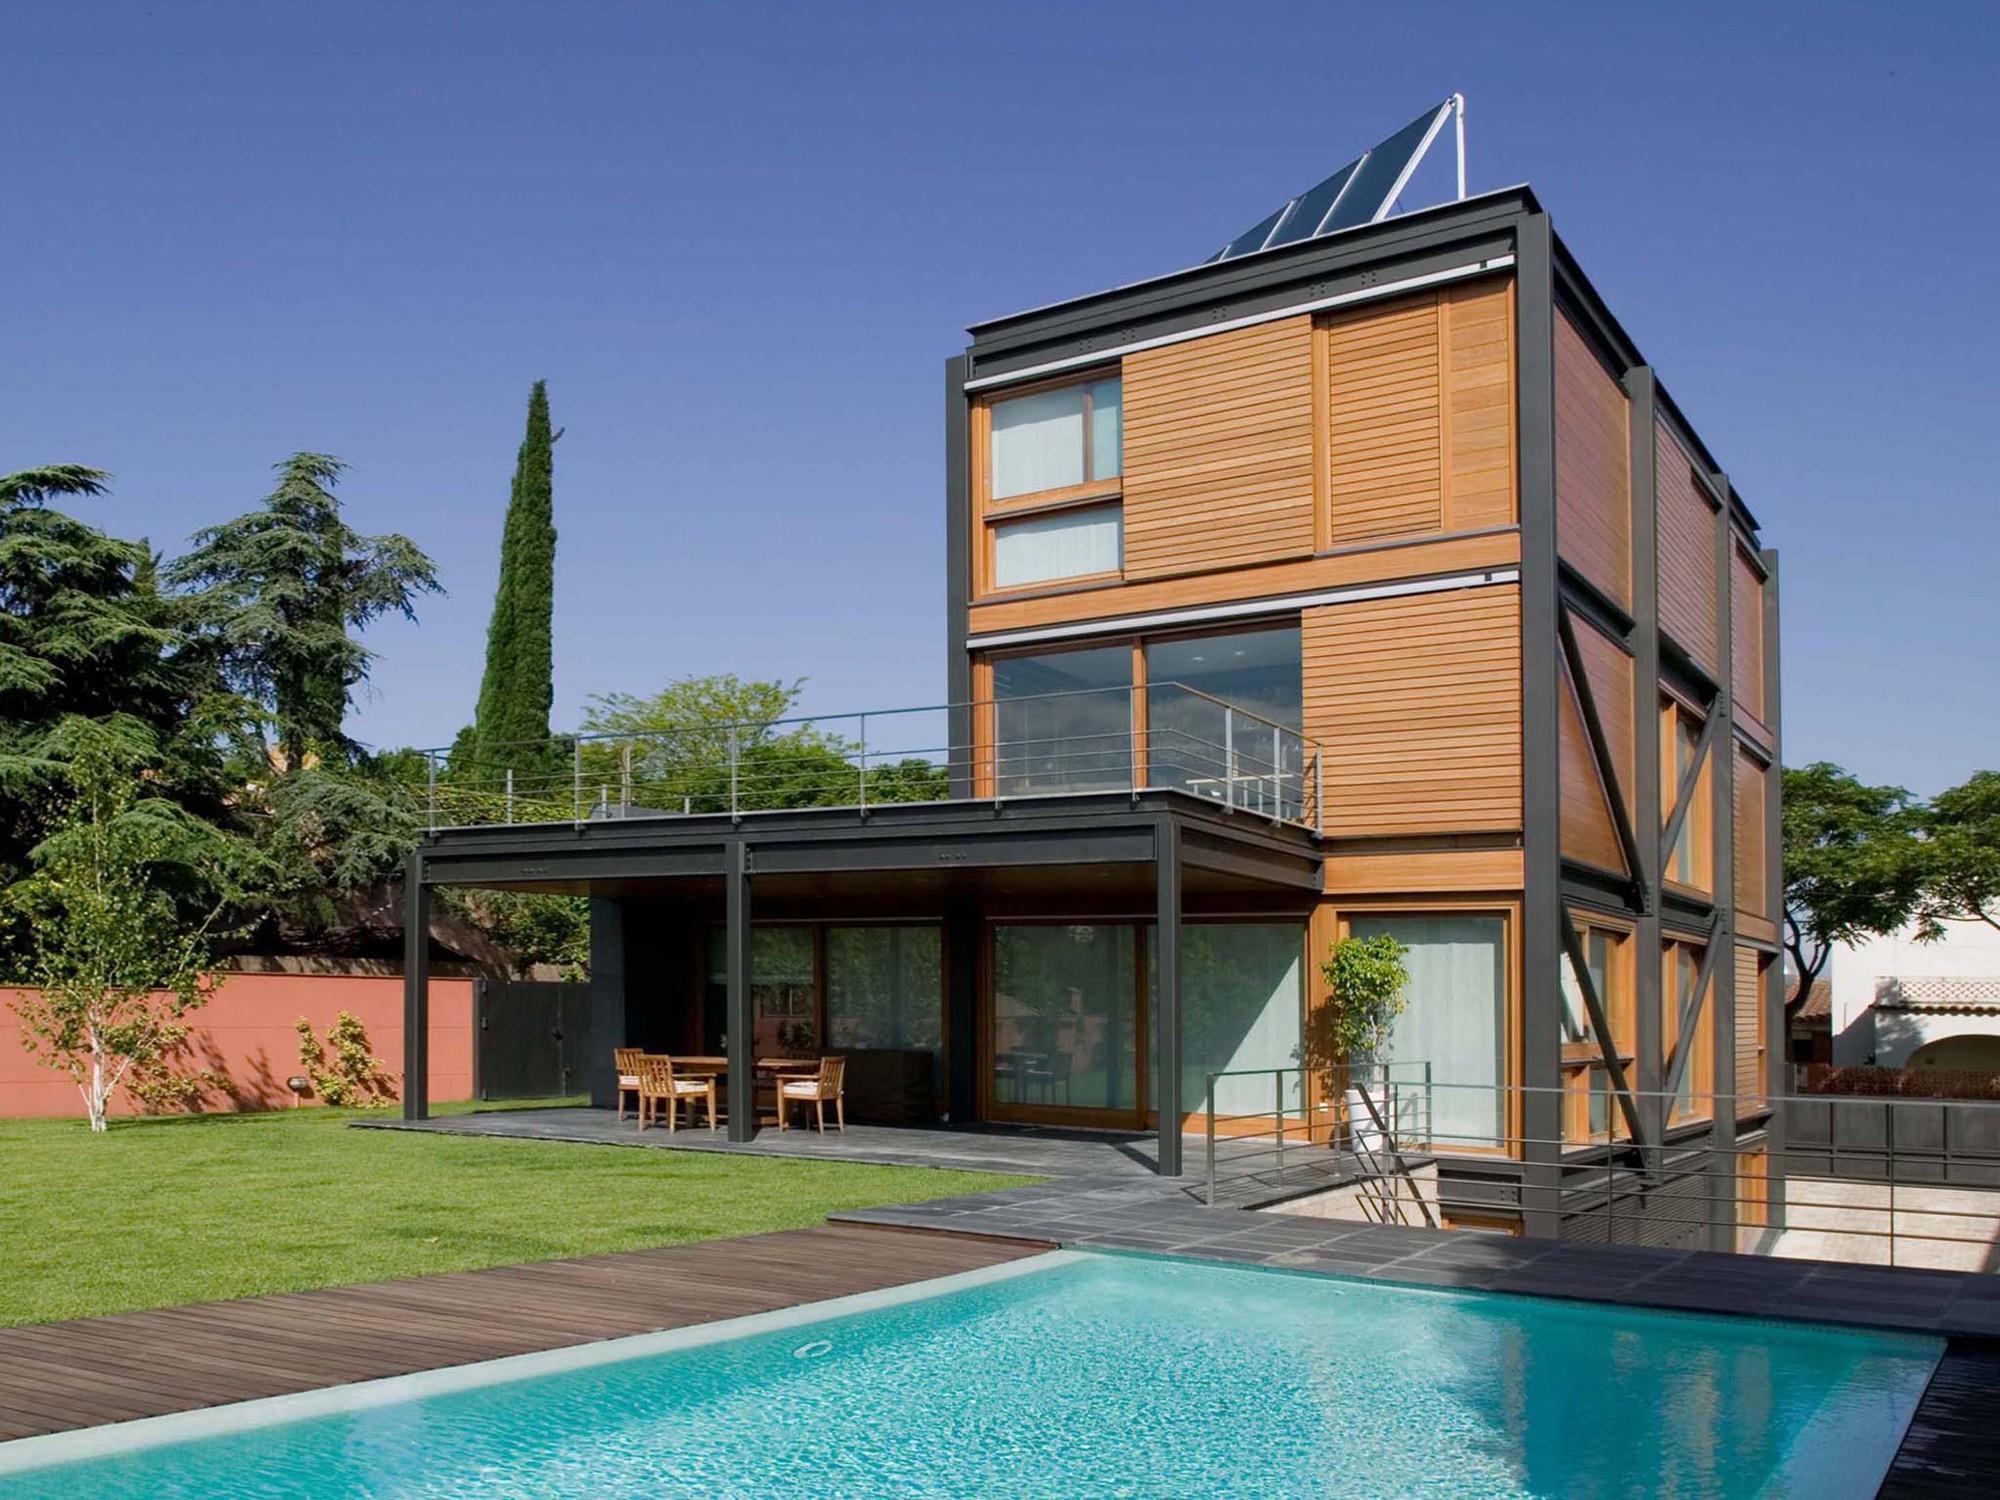 Casa P Artigas Arquitectes Archdaily M Xico